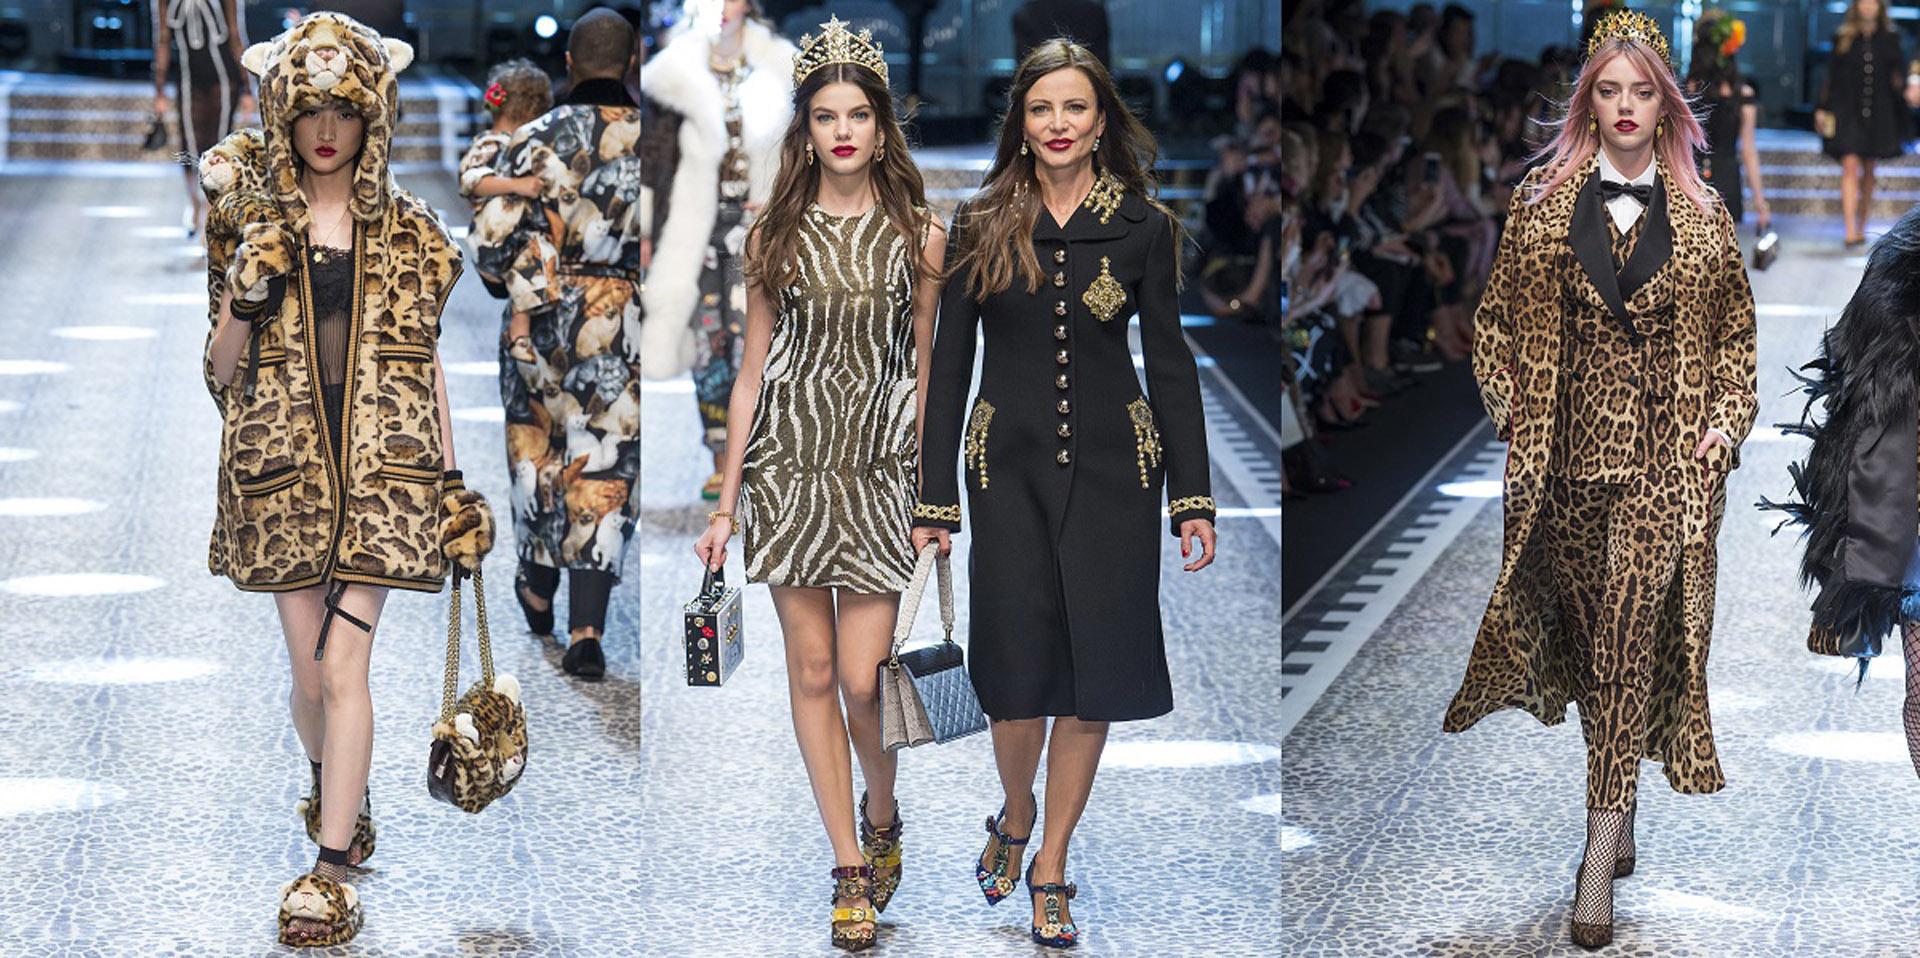 Último desfile de Dolce & Gabbana en Milán. Colección entera de animal print, icónico de la firma.